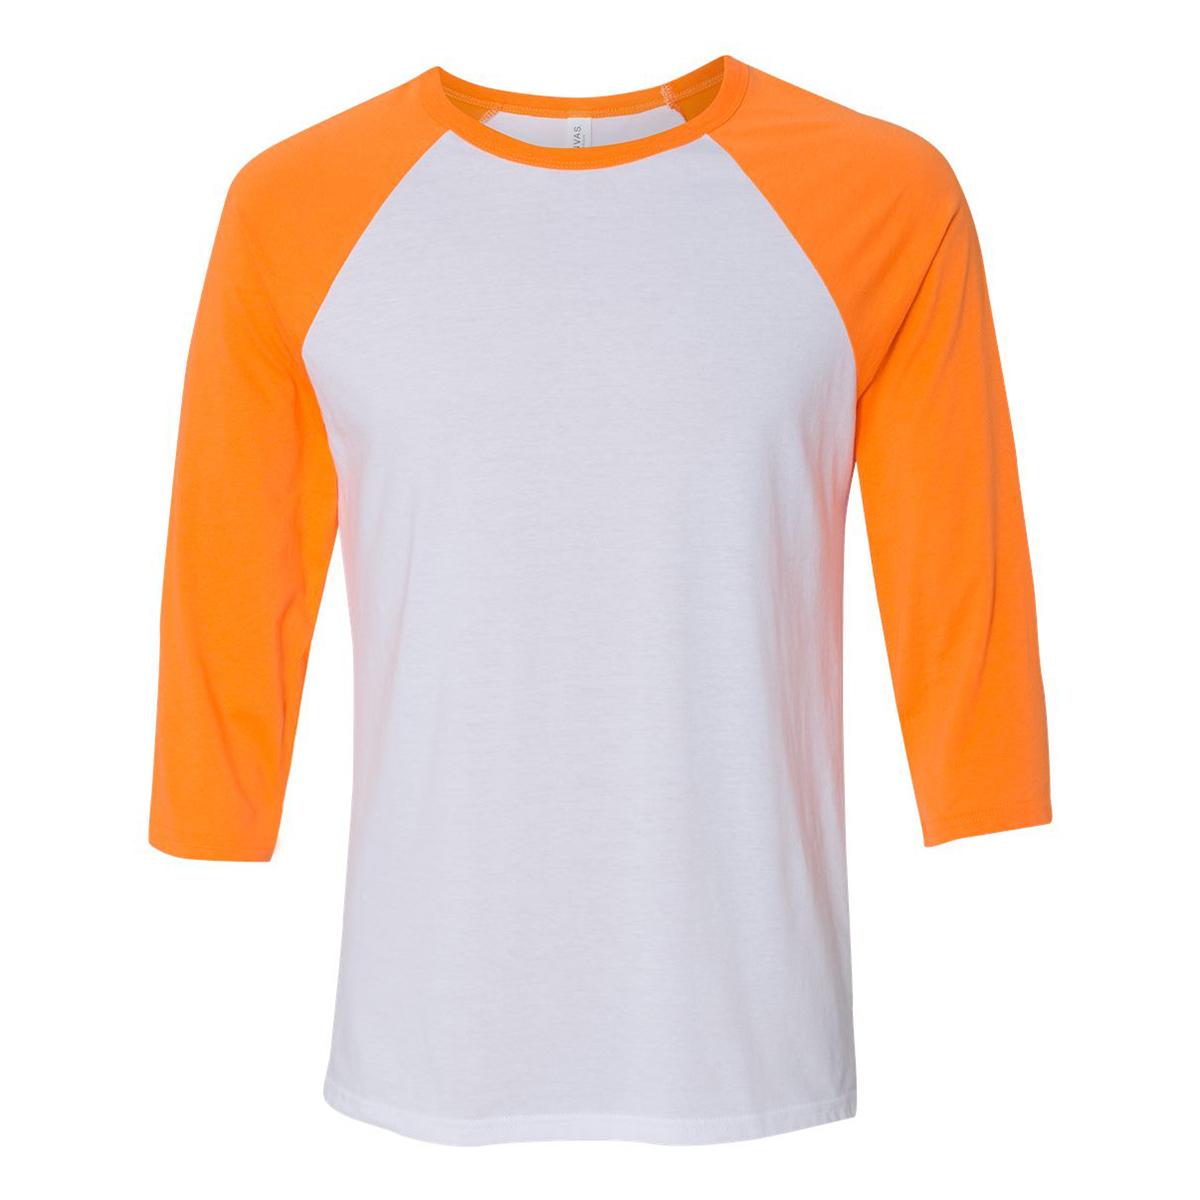 White neon orange